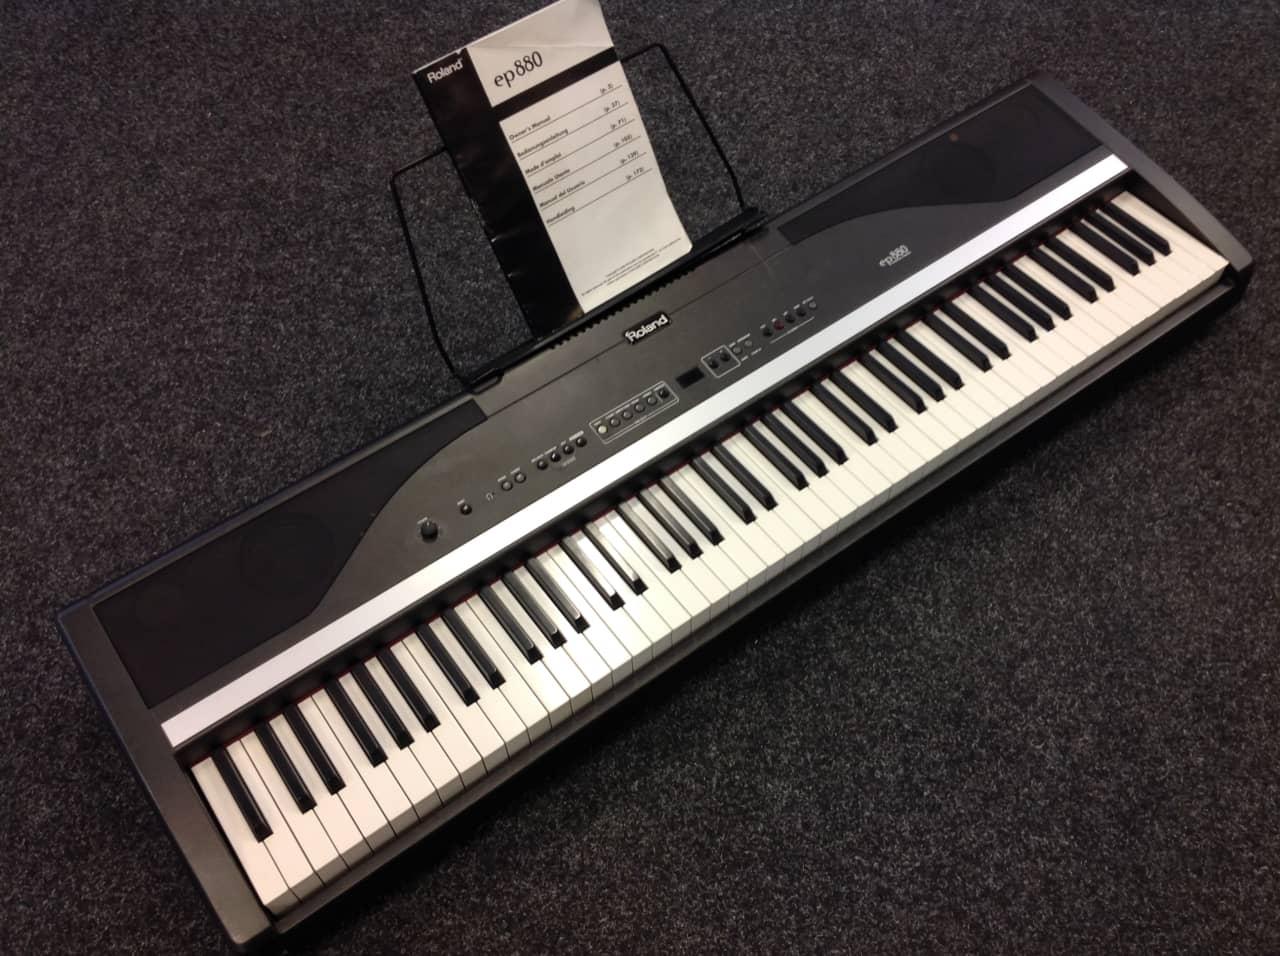 roland ep880 portable digital piano inc warranty reverb. Black Bedroom Furniture Sets. Home Design Ideas